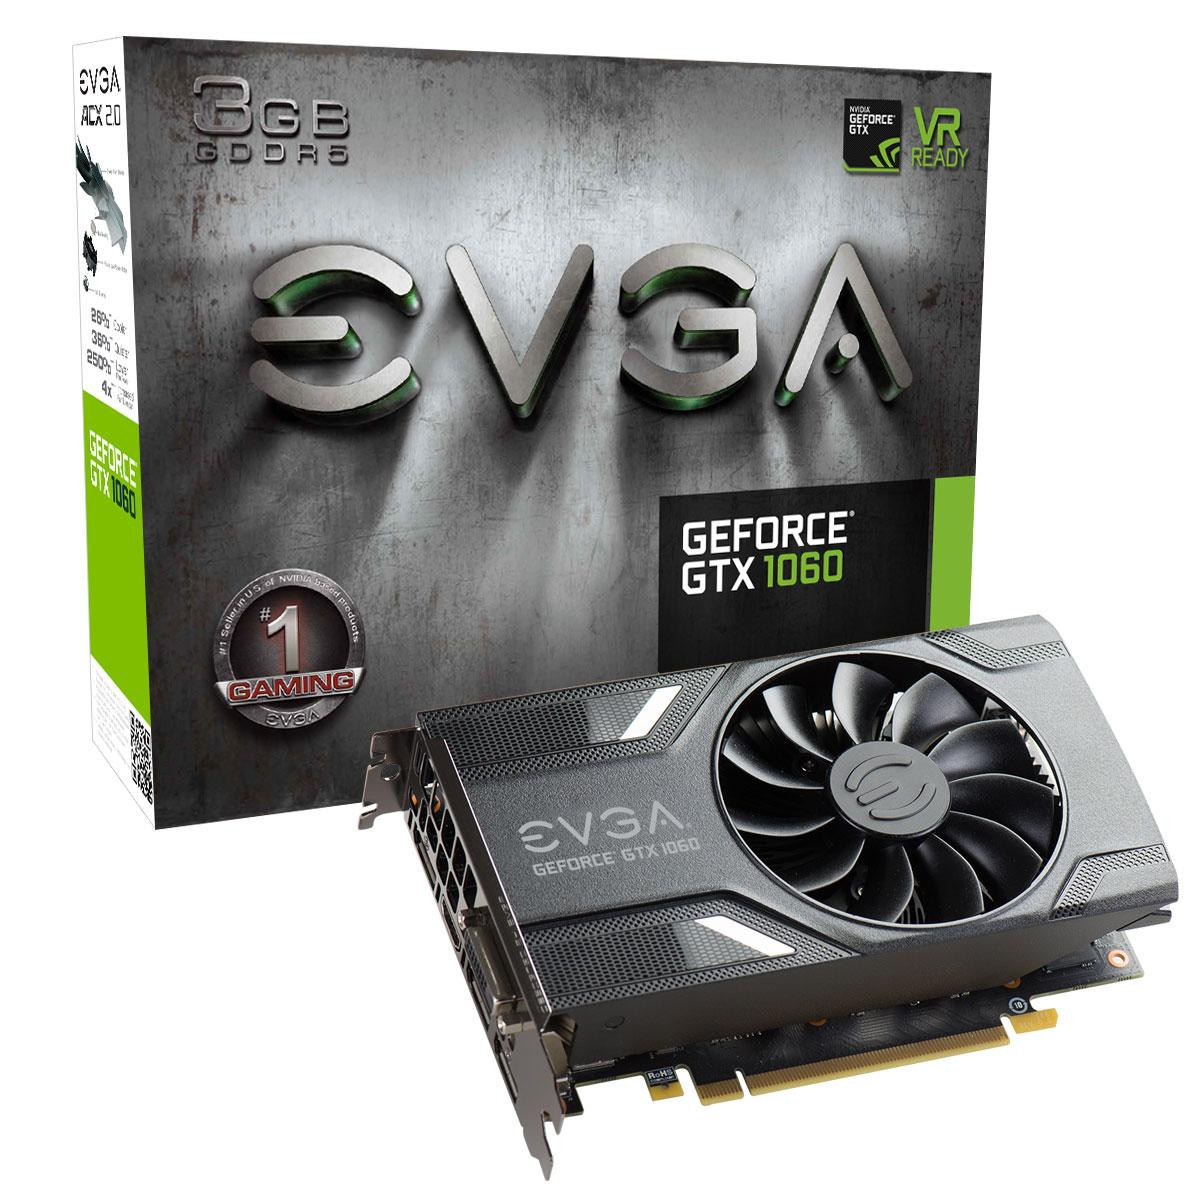 Видео карта EVGA GeForce GTX 1060 3GB GAMING 03G-P4-6160-KR, GDDR5, 192 bit, DVI-D, DisplayPort, HDMI